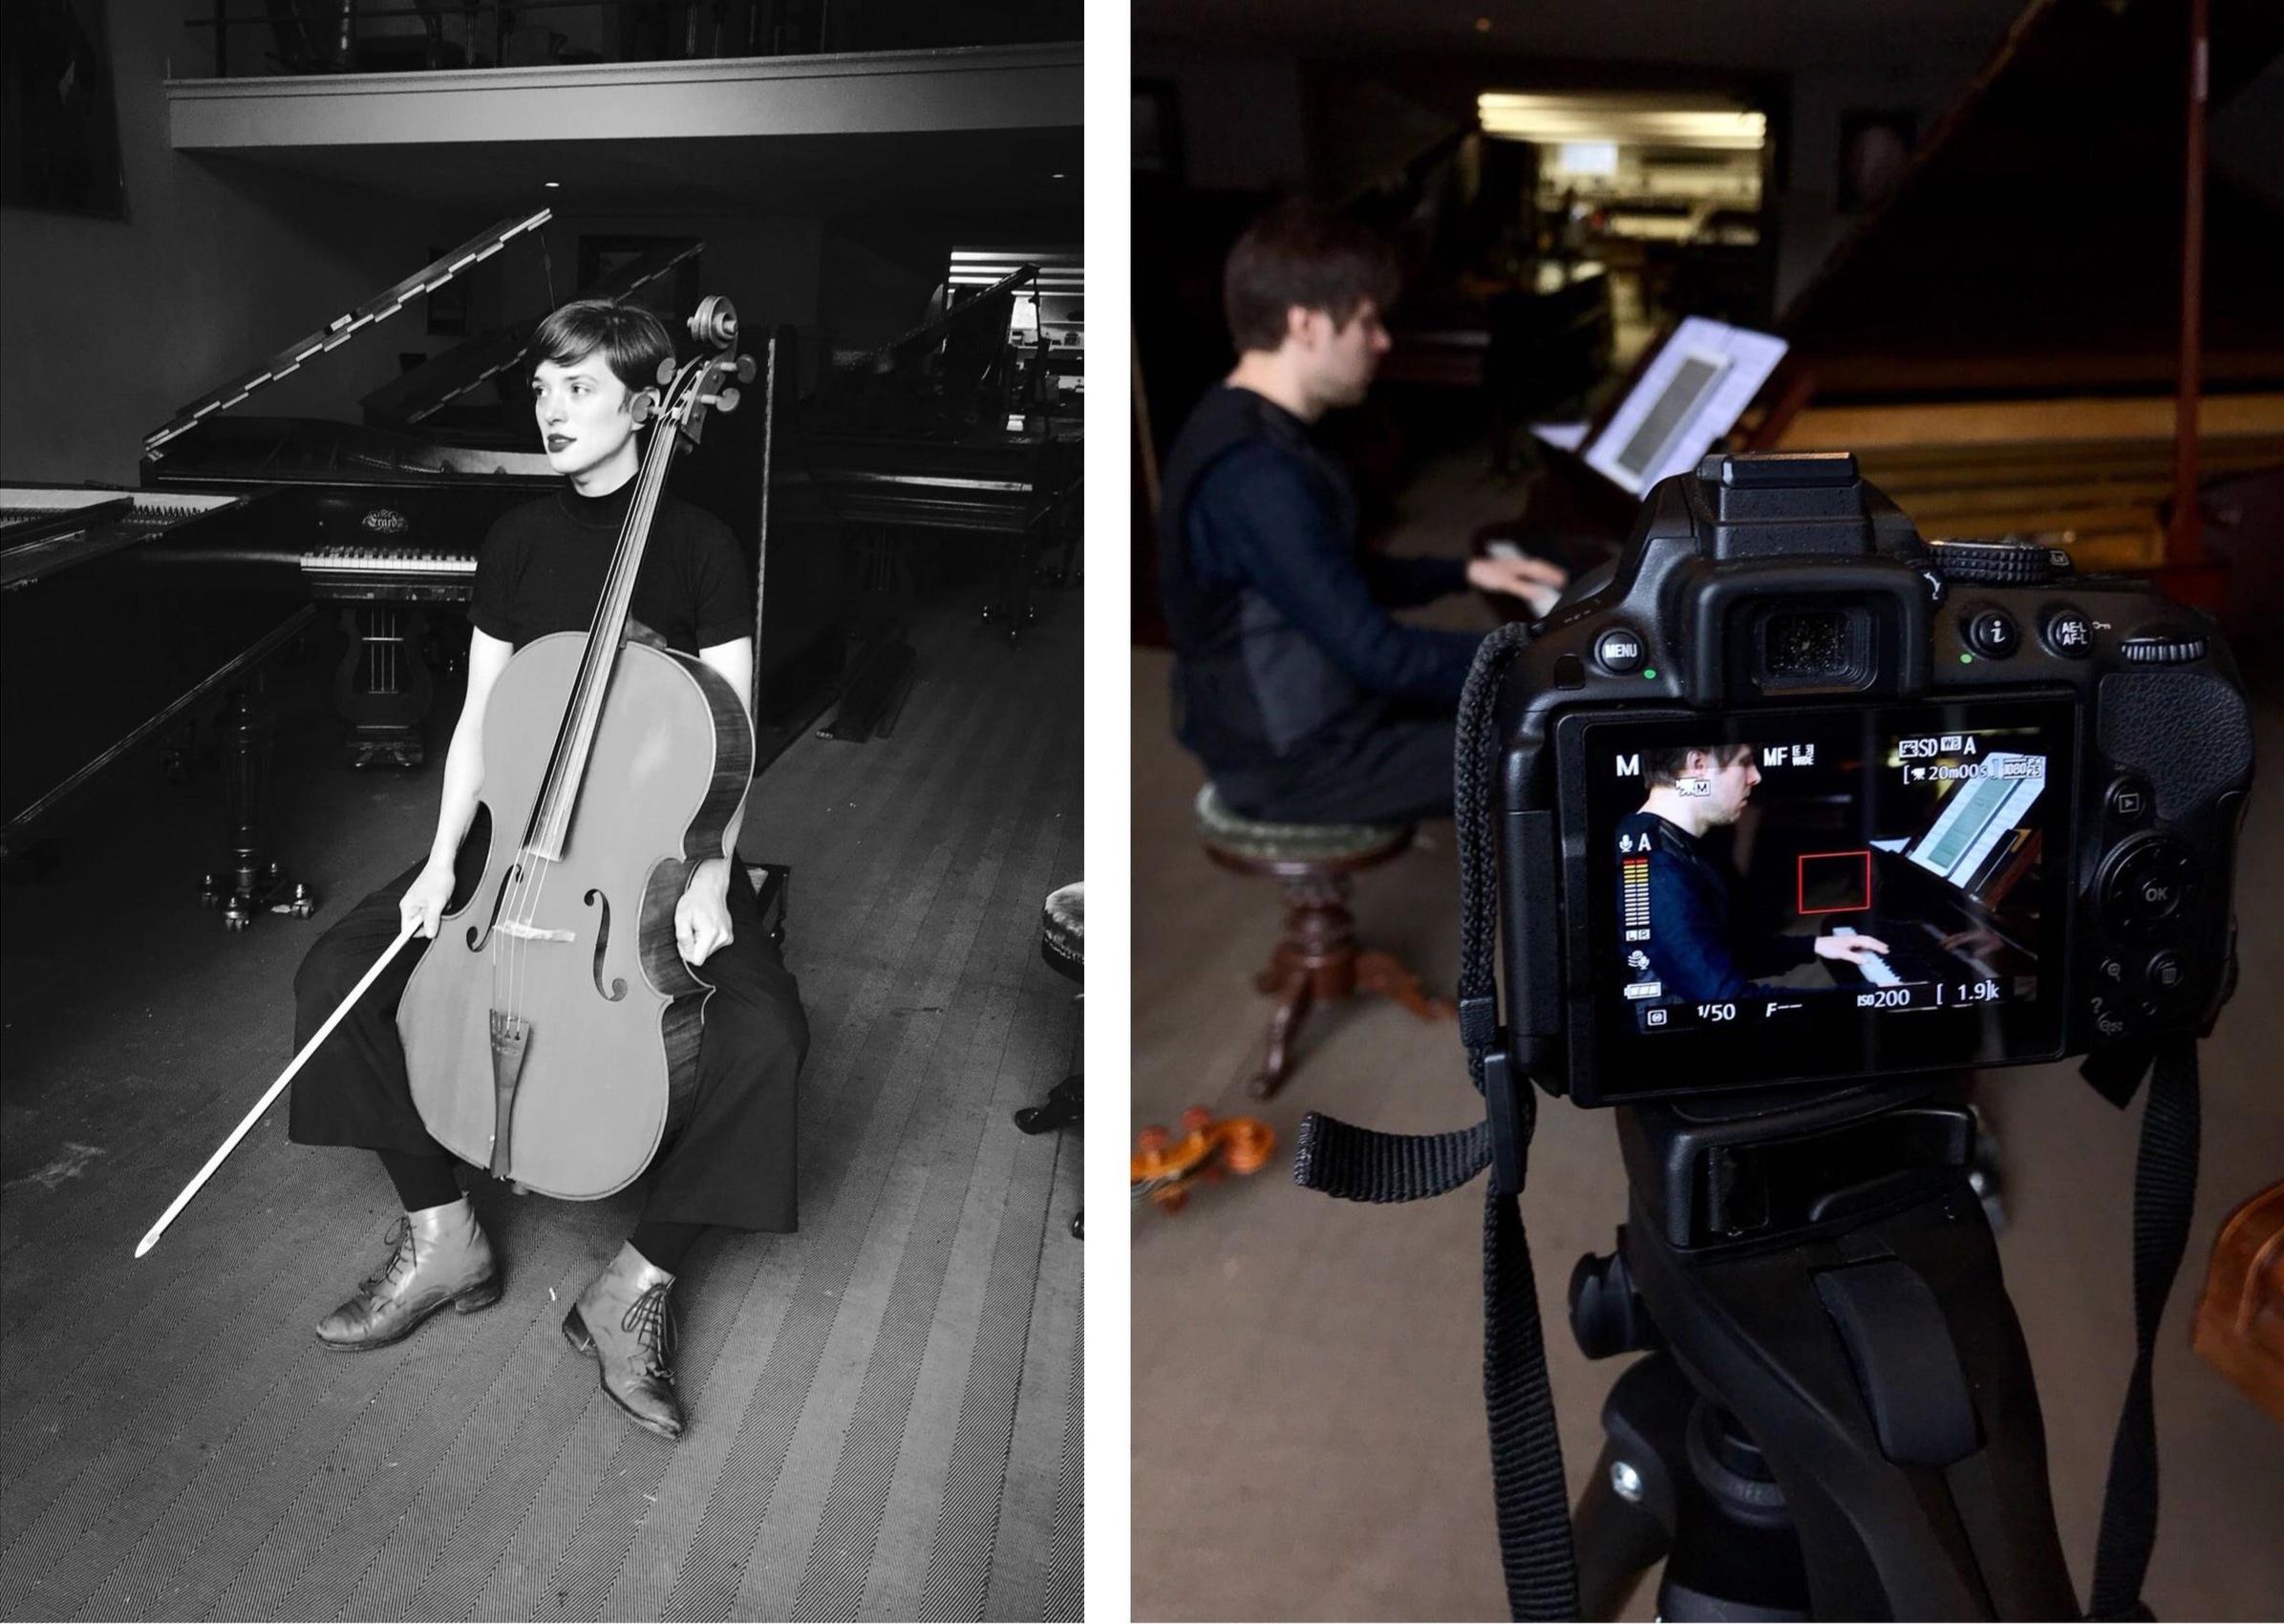 Romantic Lab: rediscovering Romantic performance practice